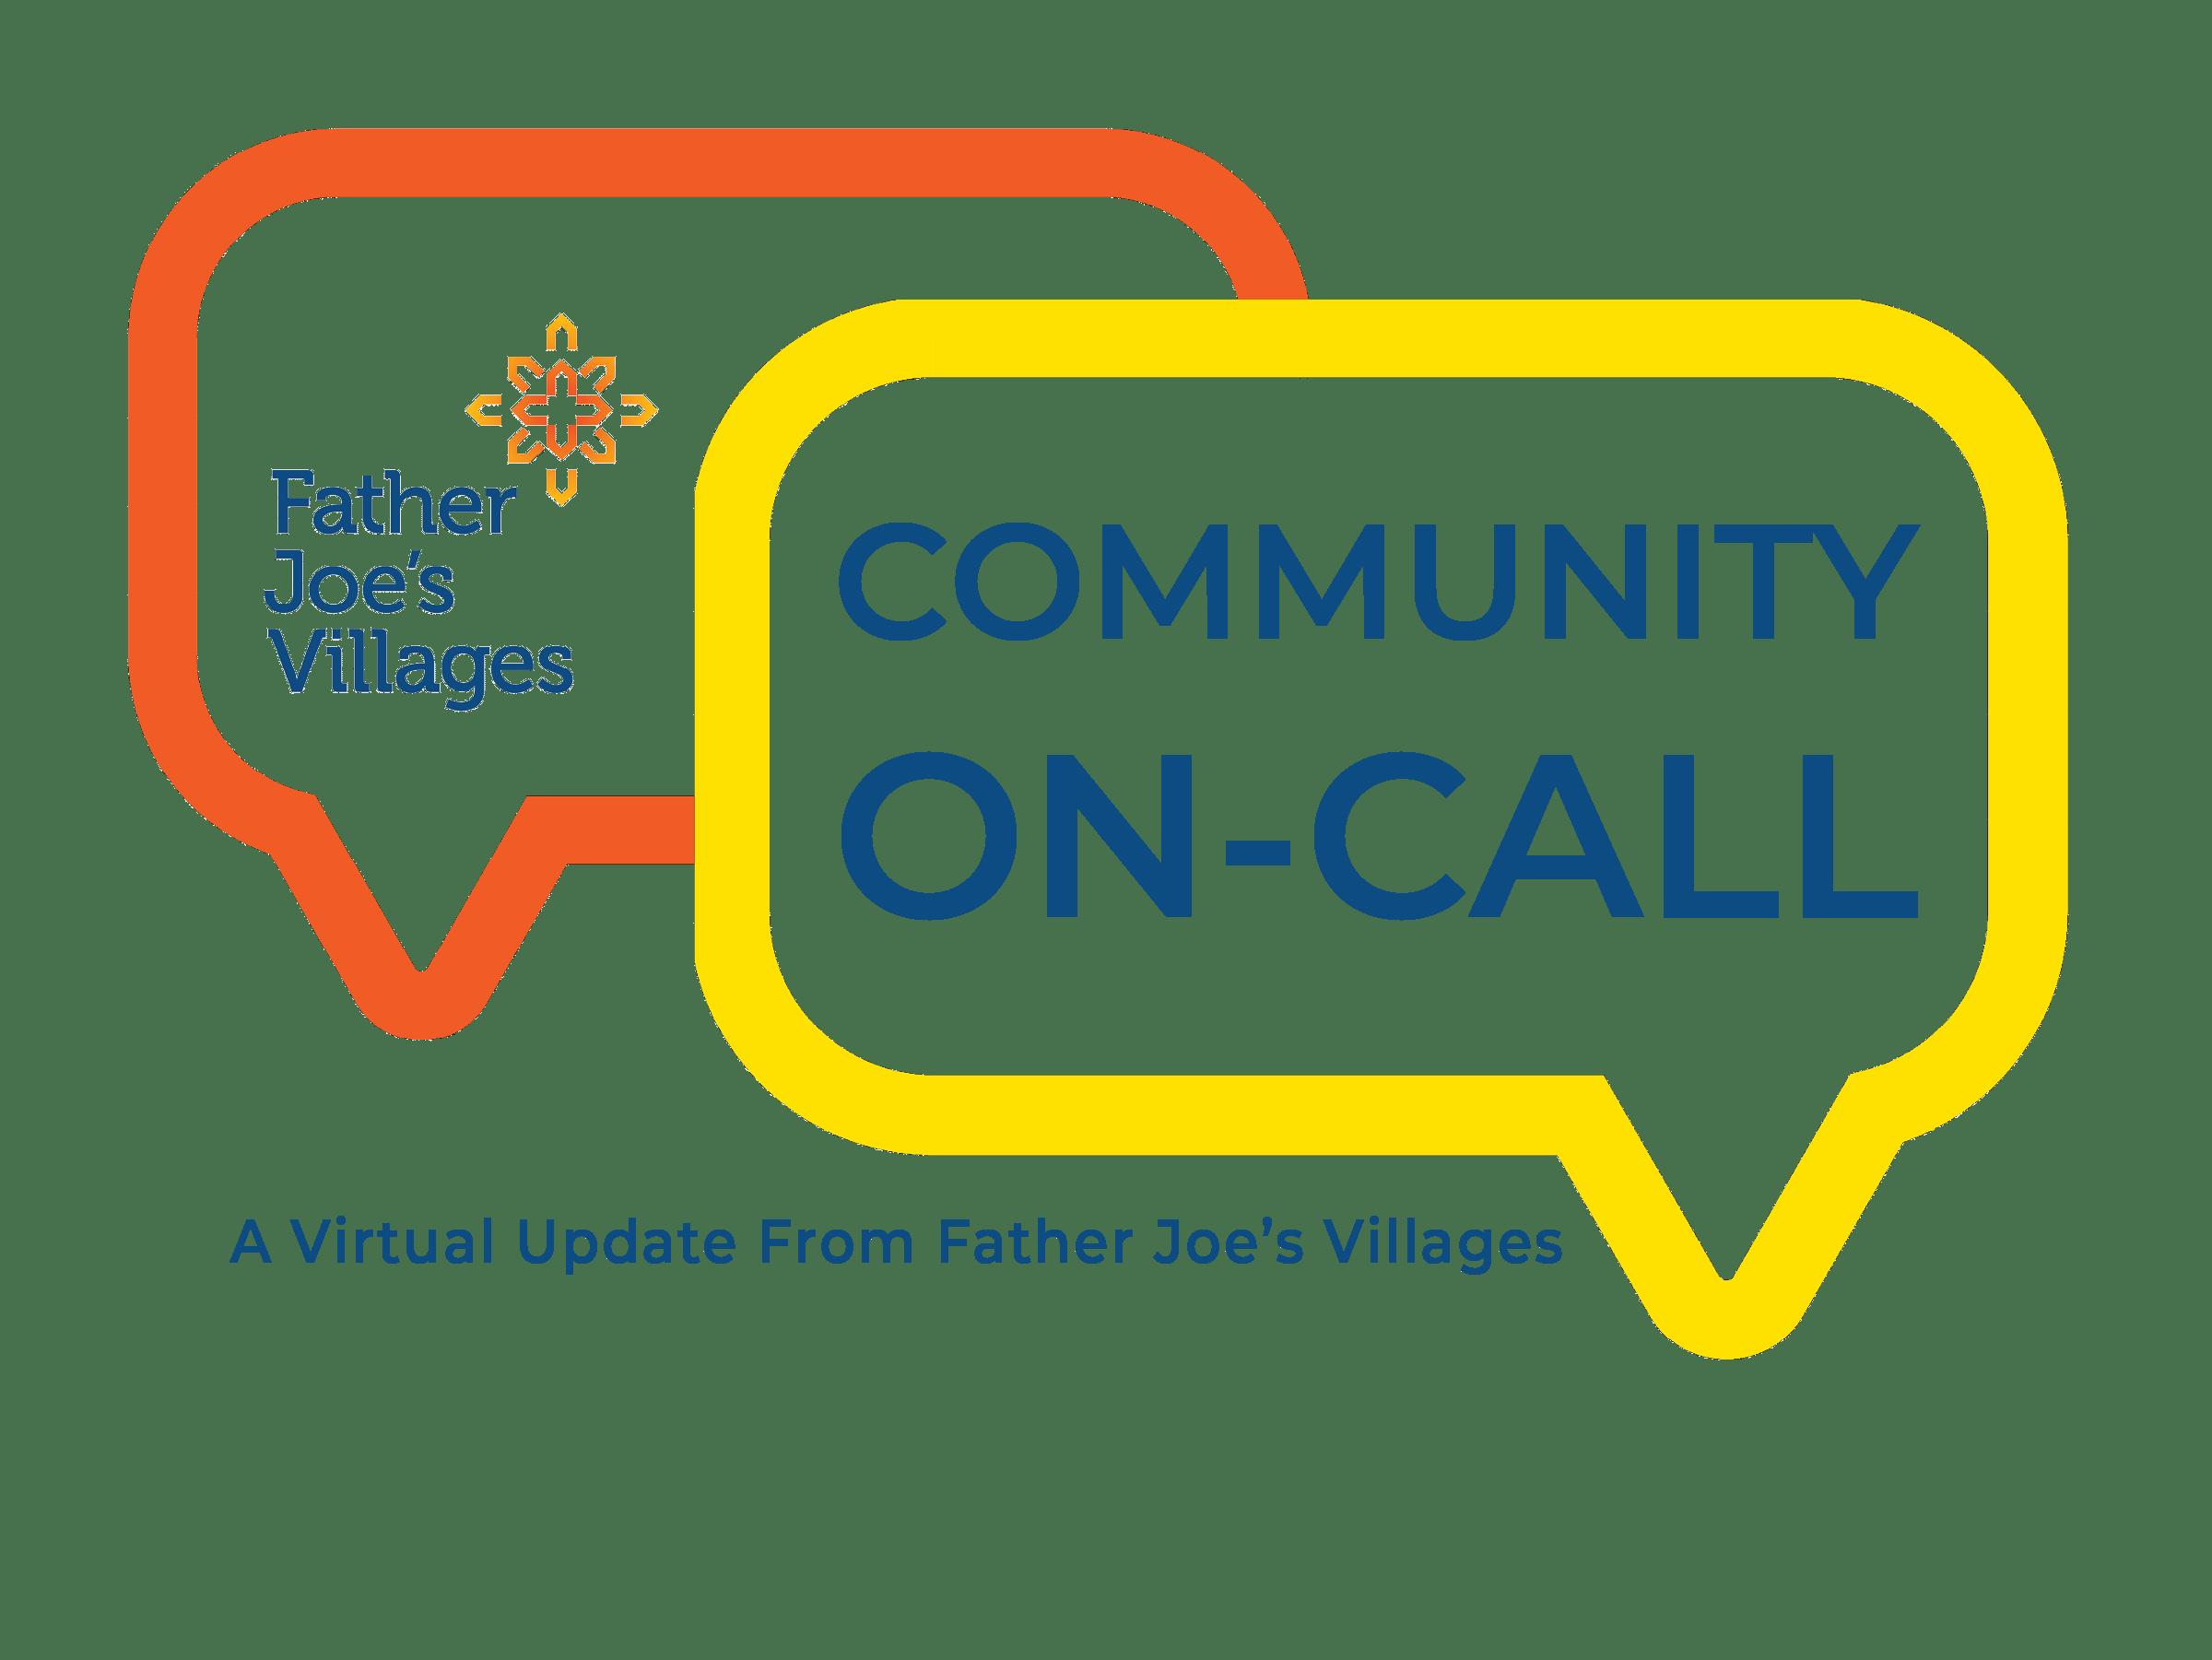 Community On-Call